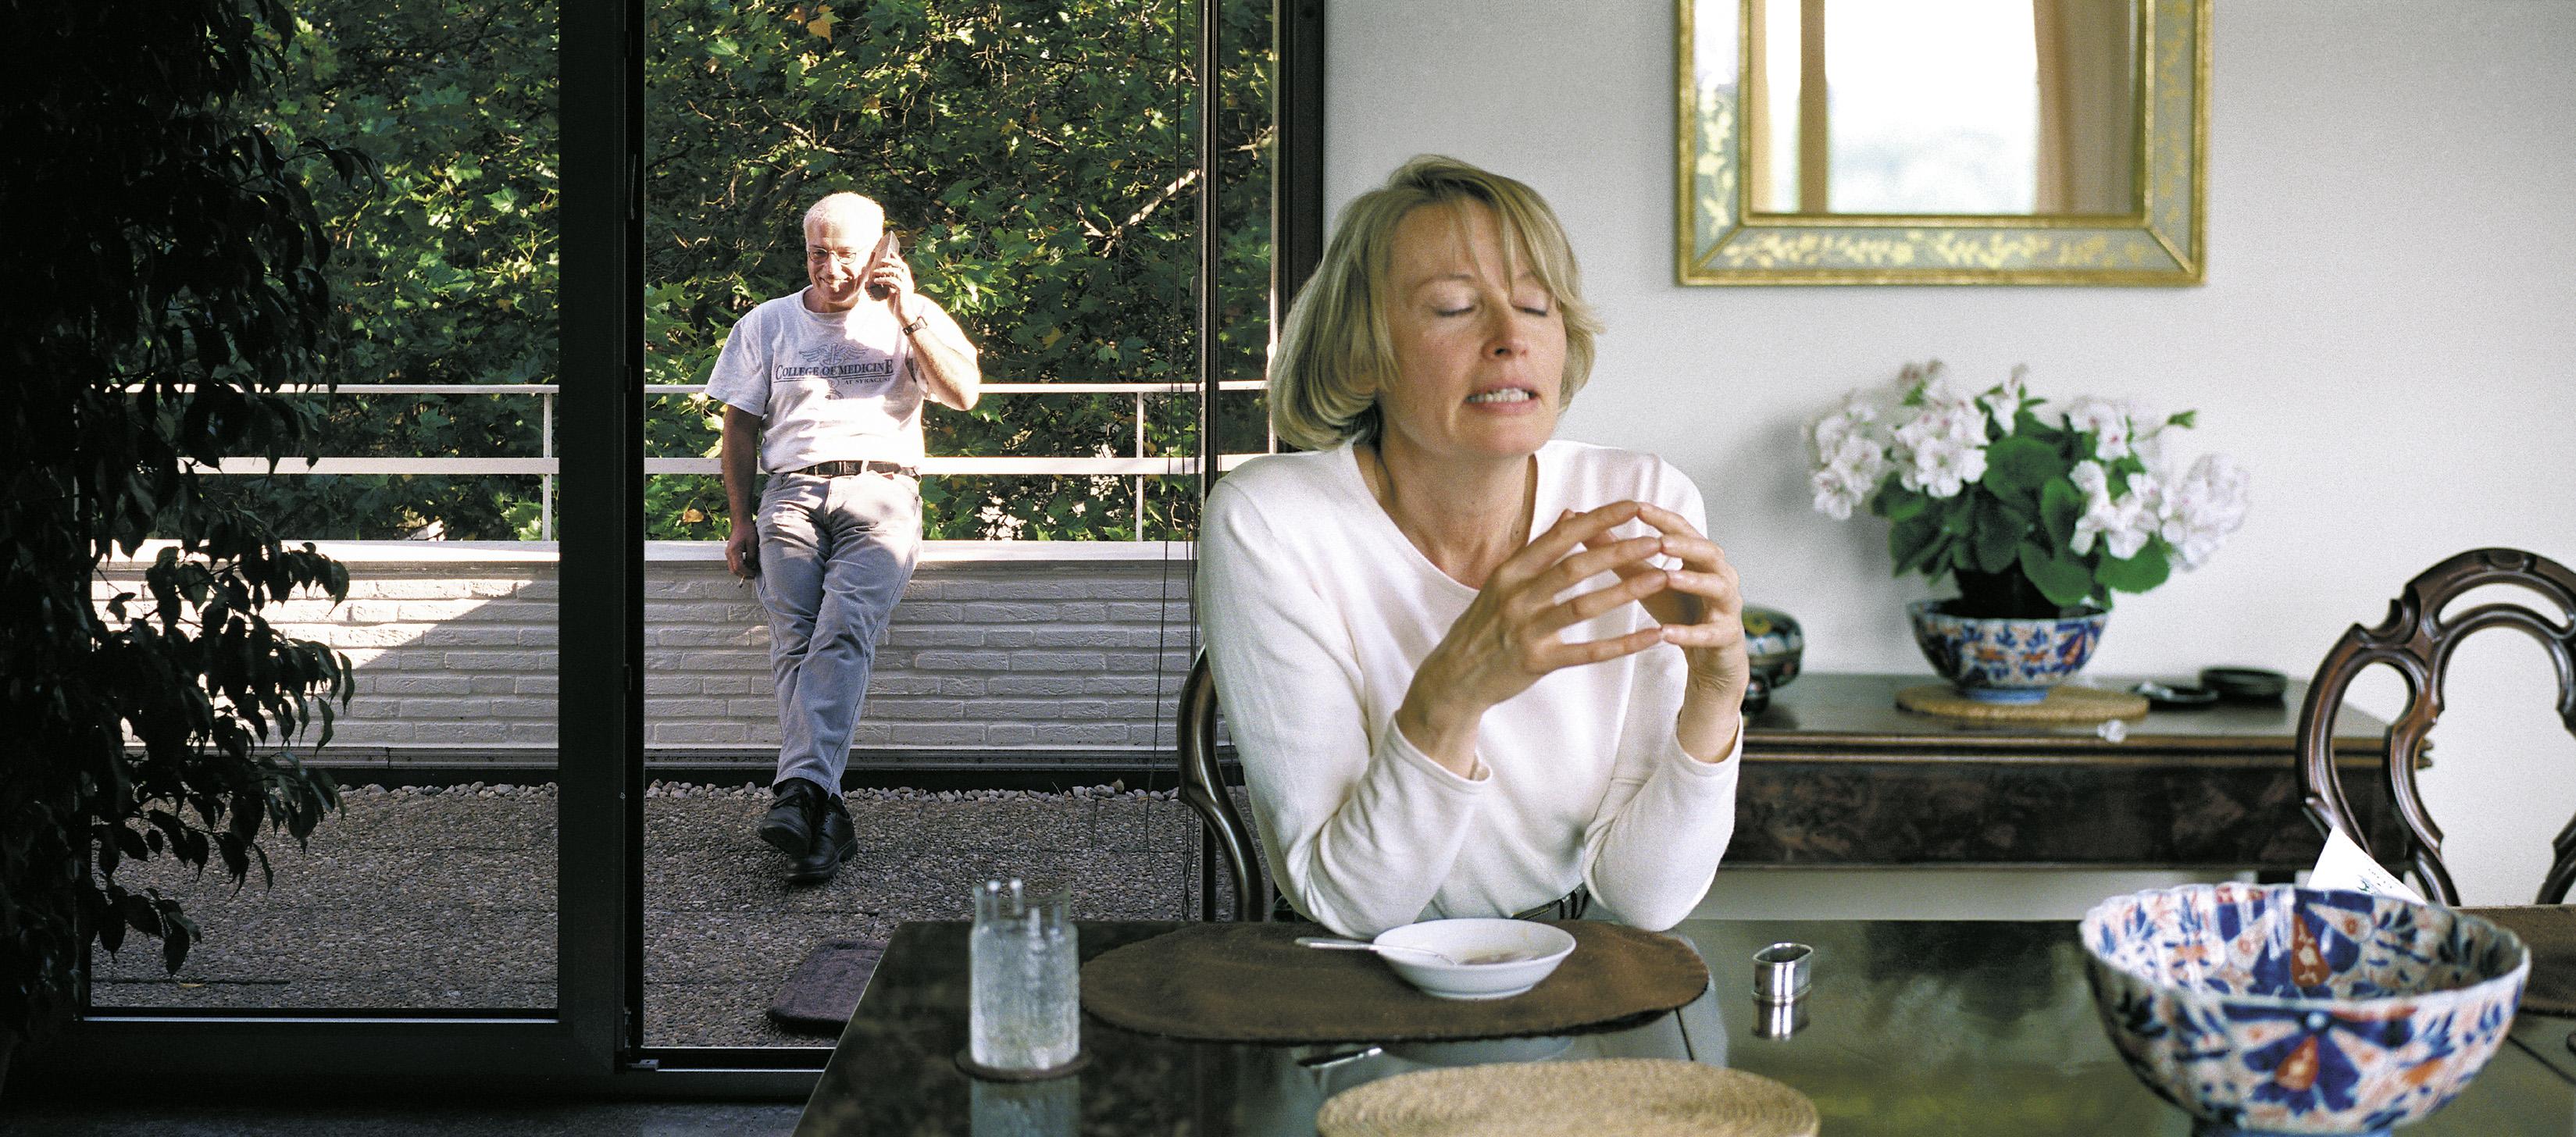 Christopher Muller, Lunch, 2000, C-Print hinter Acrylglas, 52x118 (Copyright: C. Muller